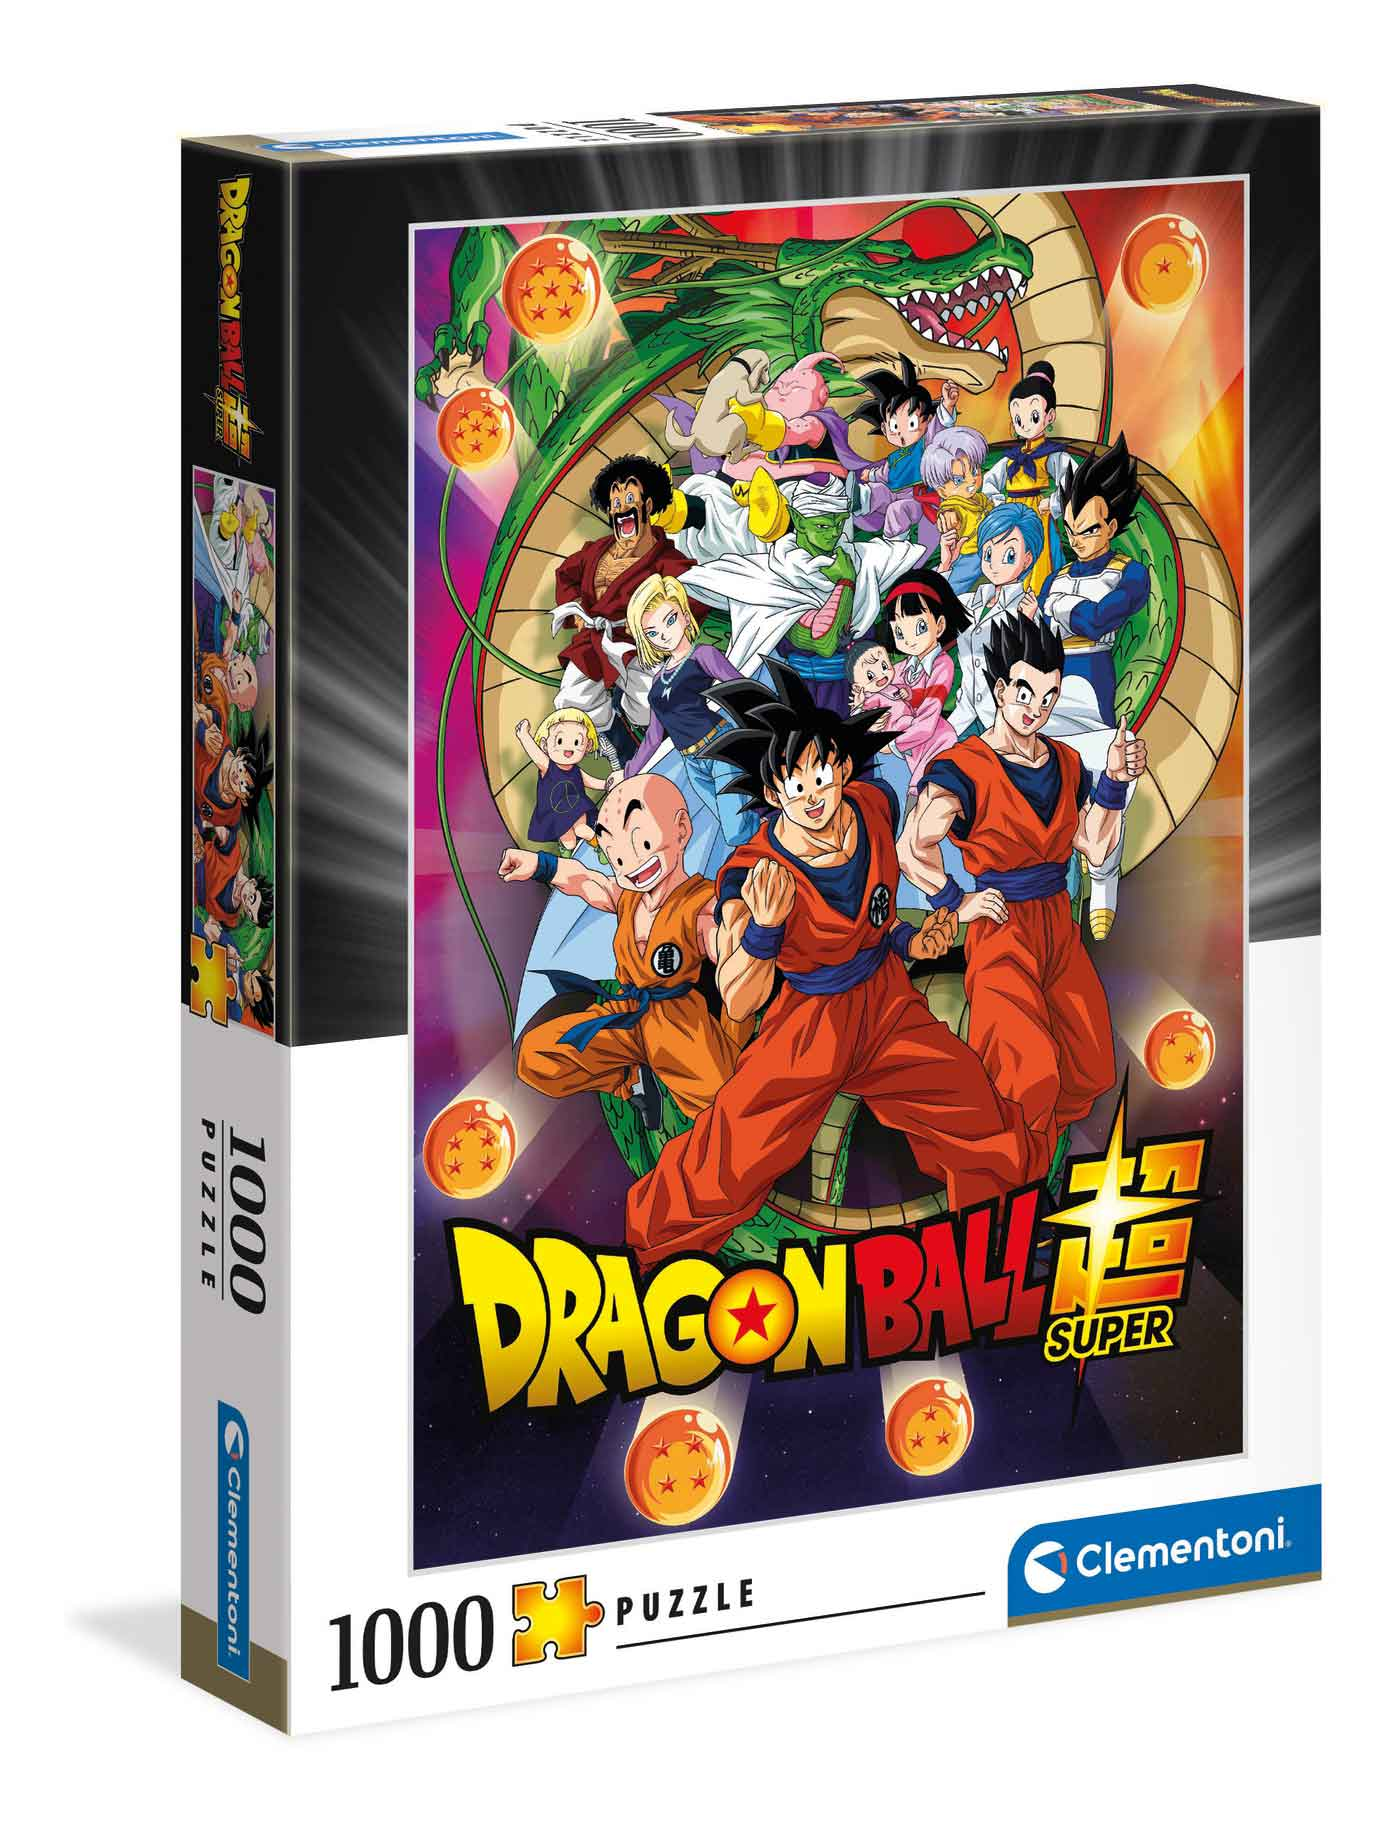 Puzzle Clementoni Dragon Ball Super de 1000 Piezas